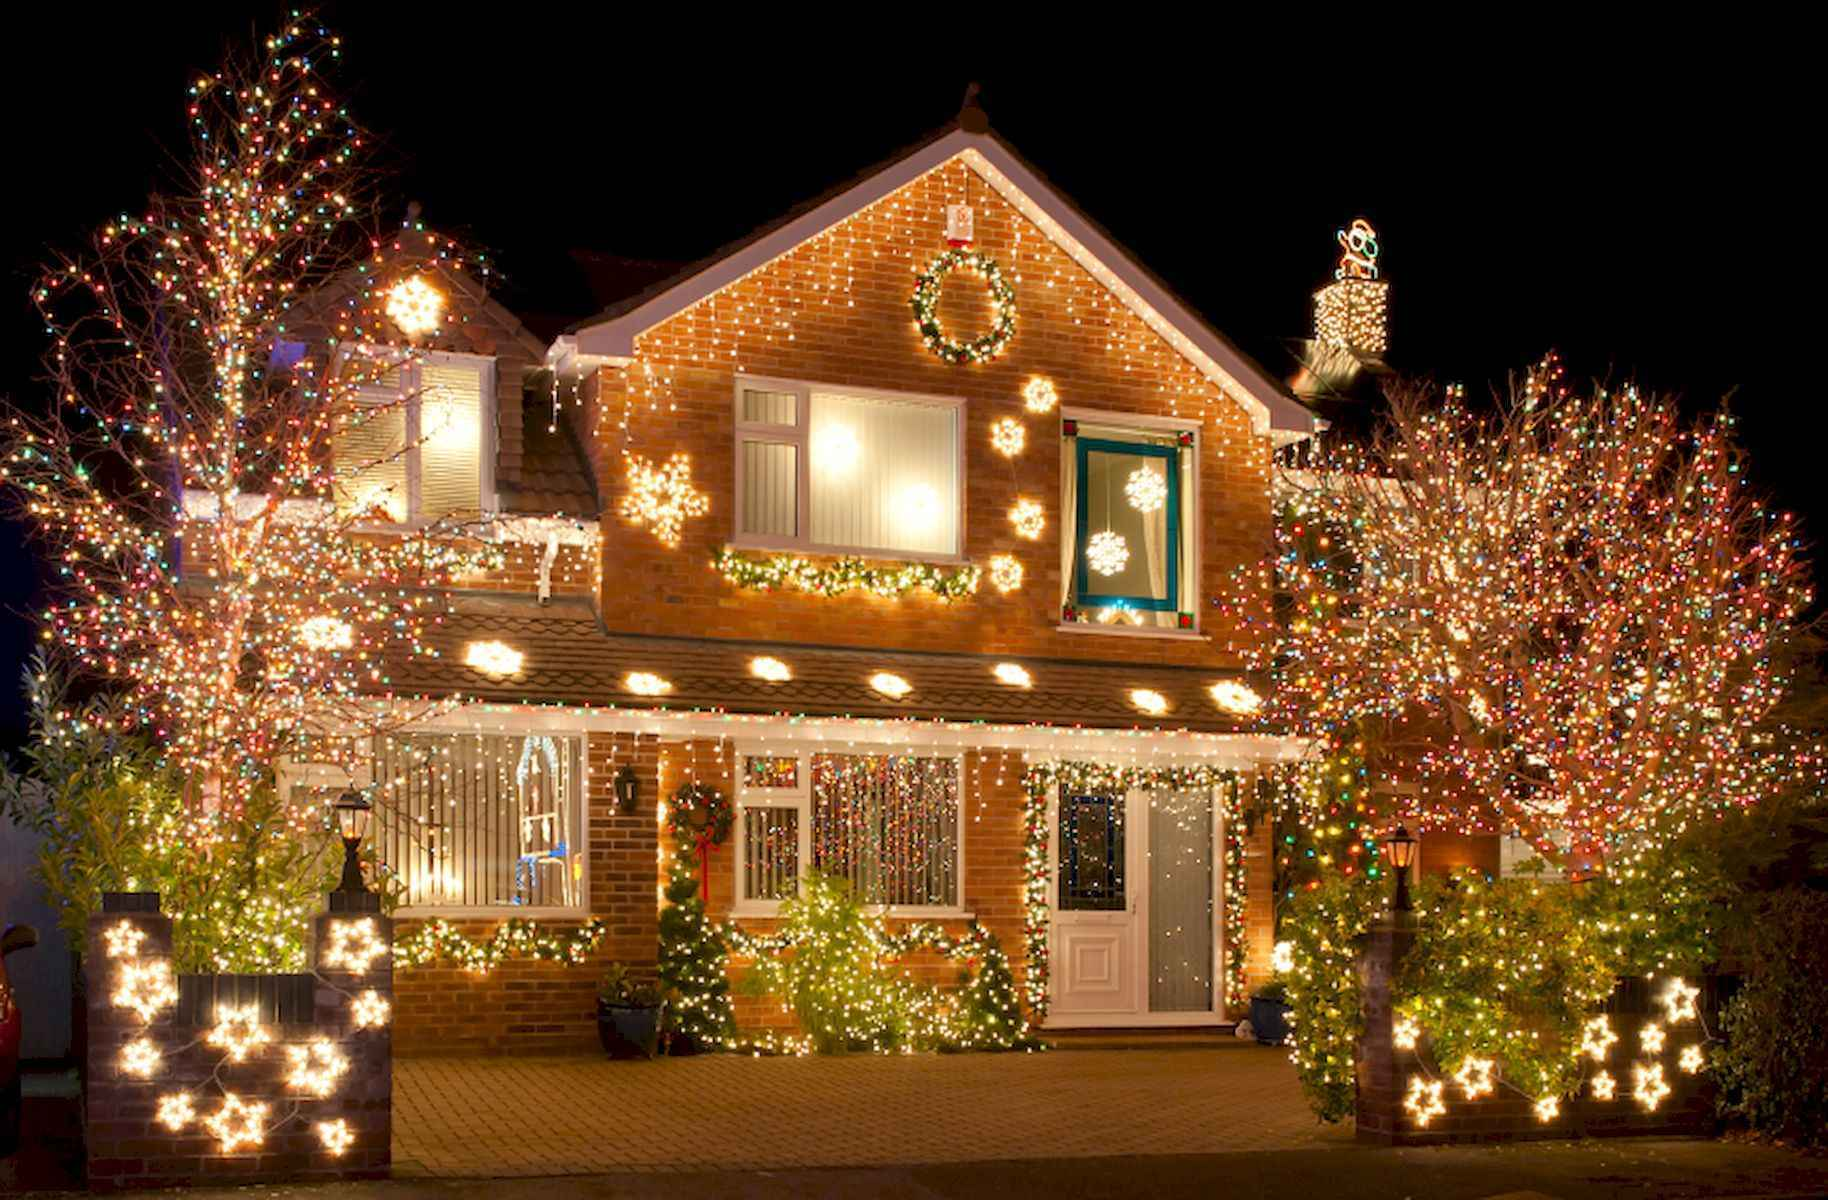 40 amazing outdoor christmas decorations ideas (40)